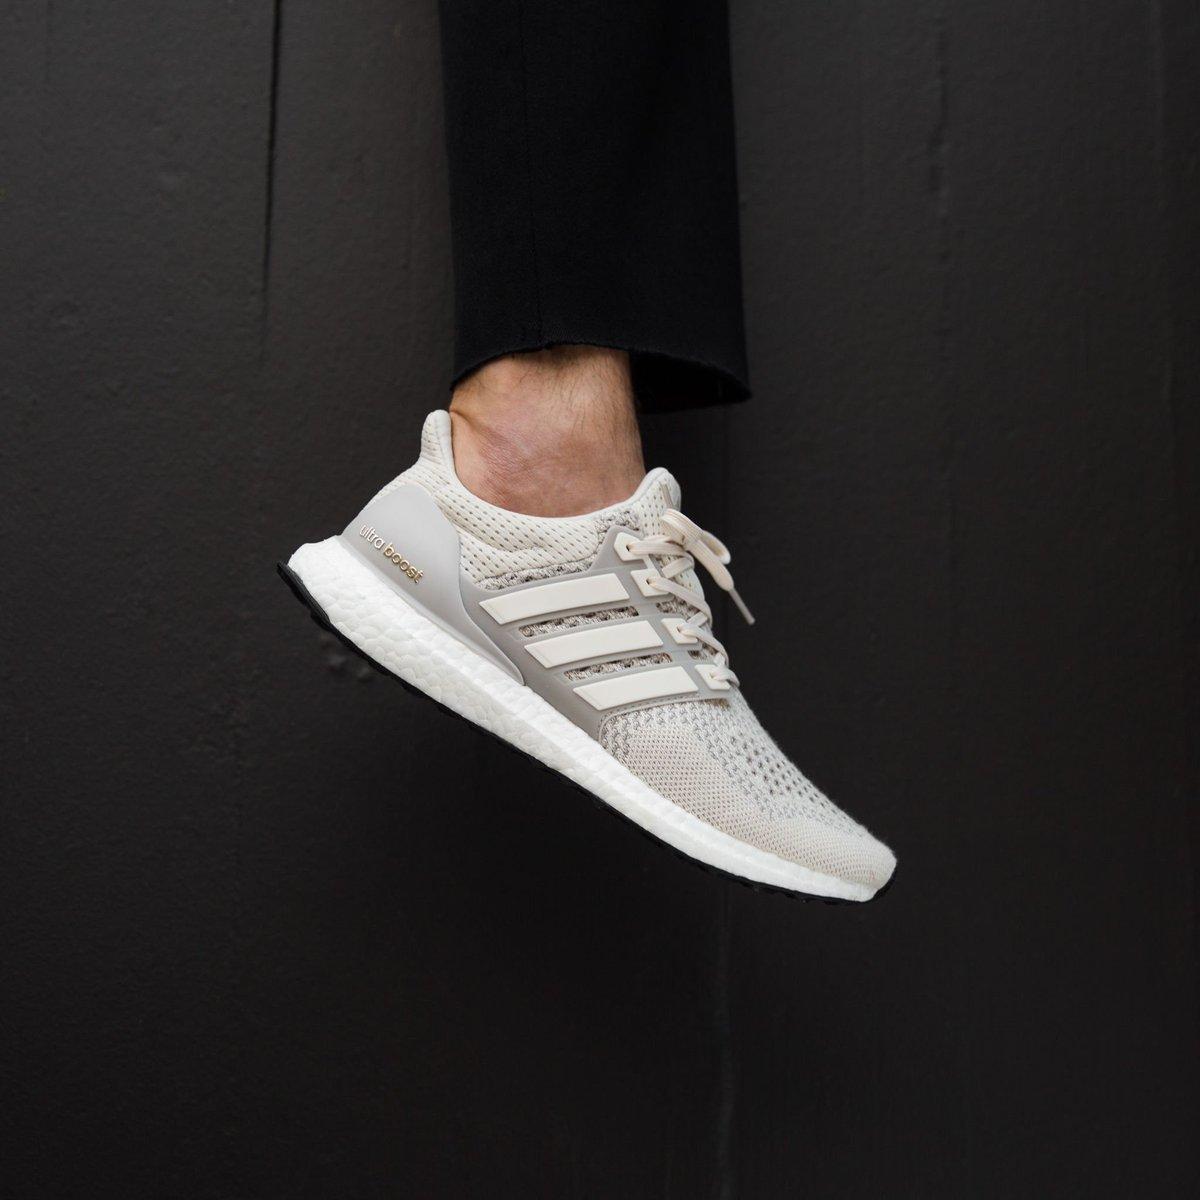 adidas ultra boost ltd talc clear white clear granite